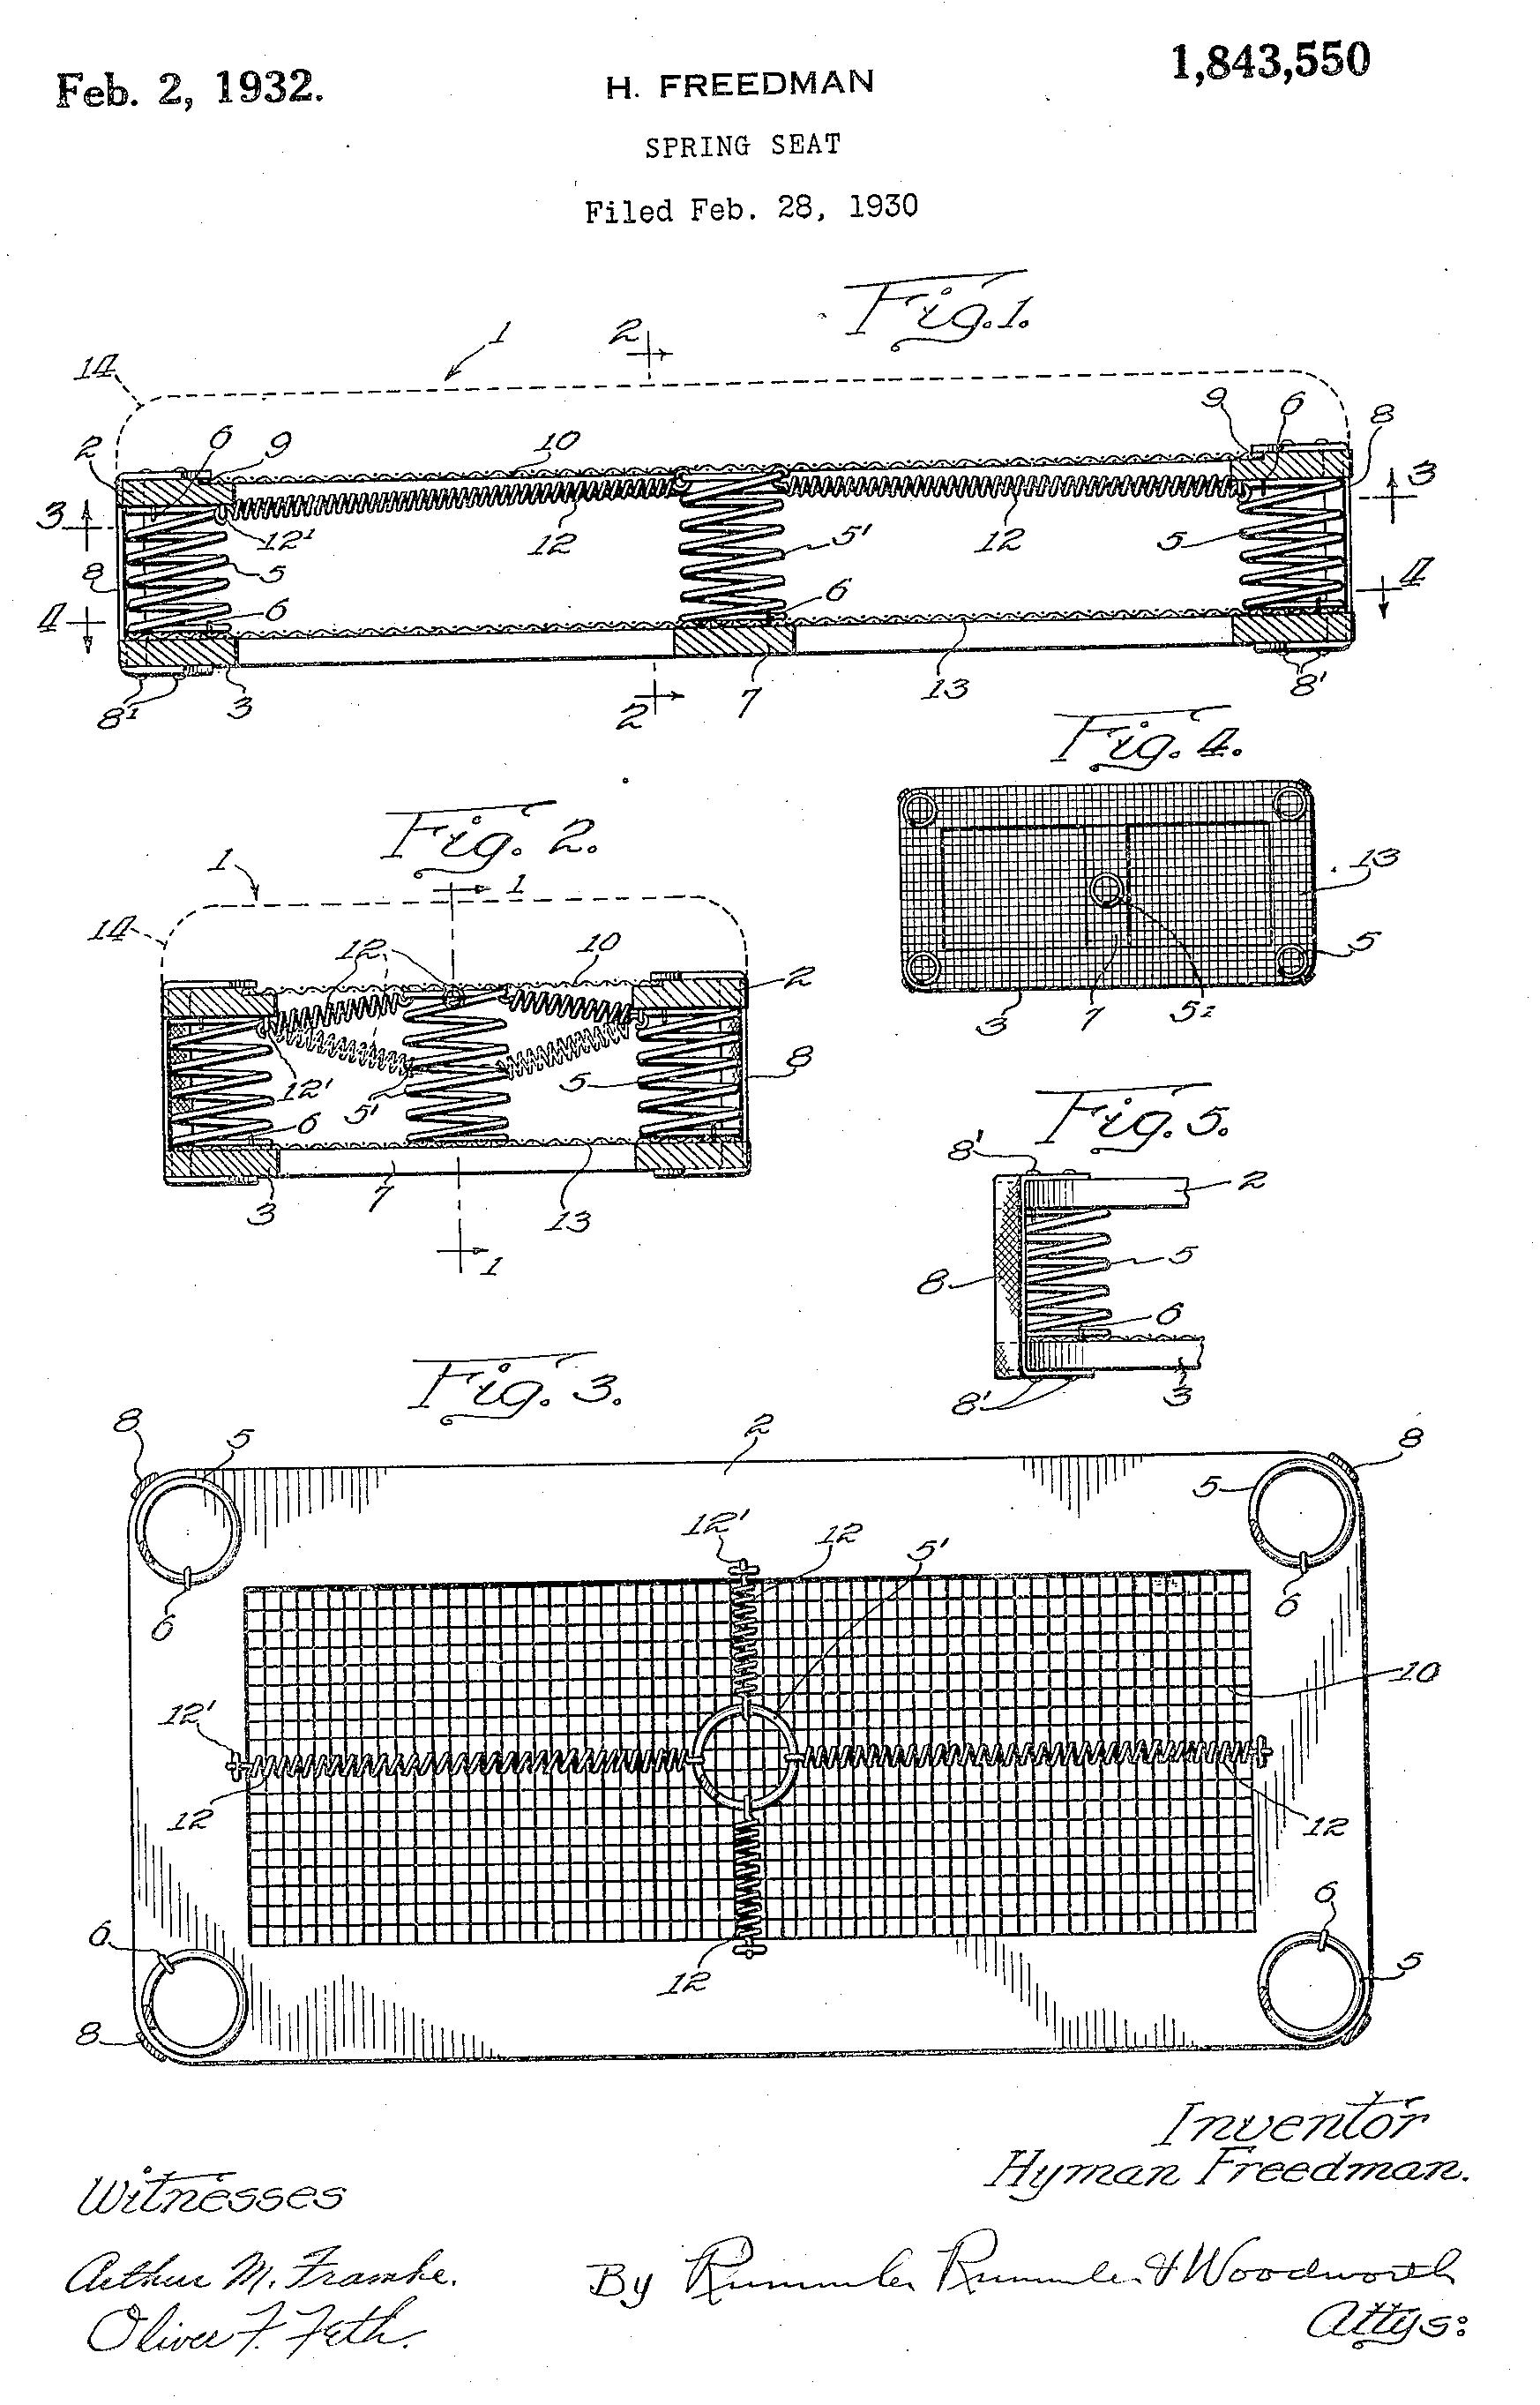 U.S. Patent #1843550